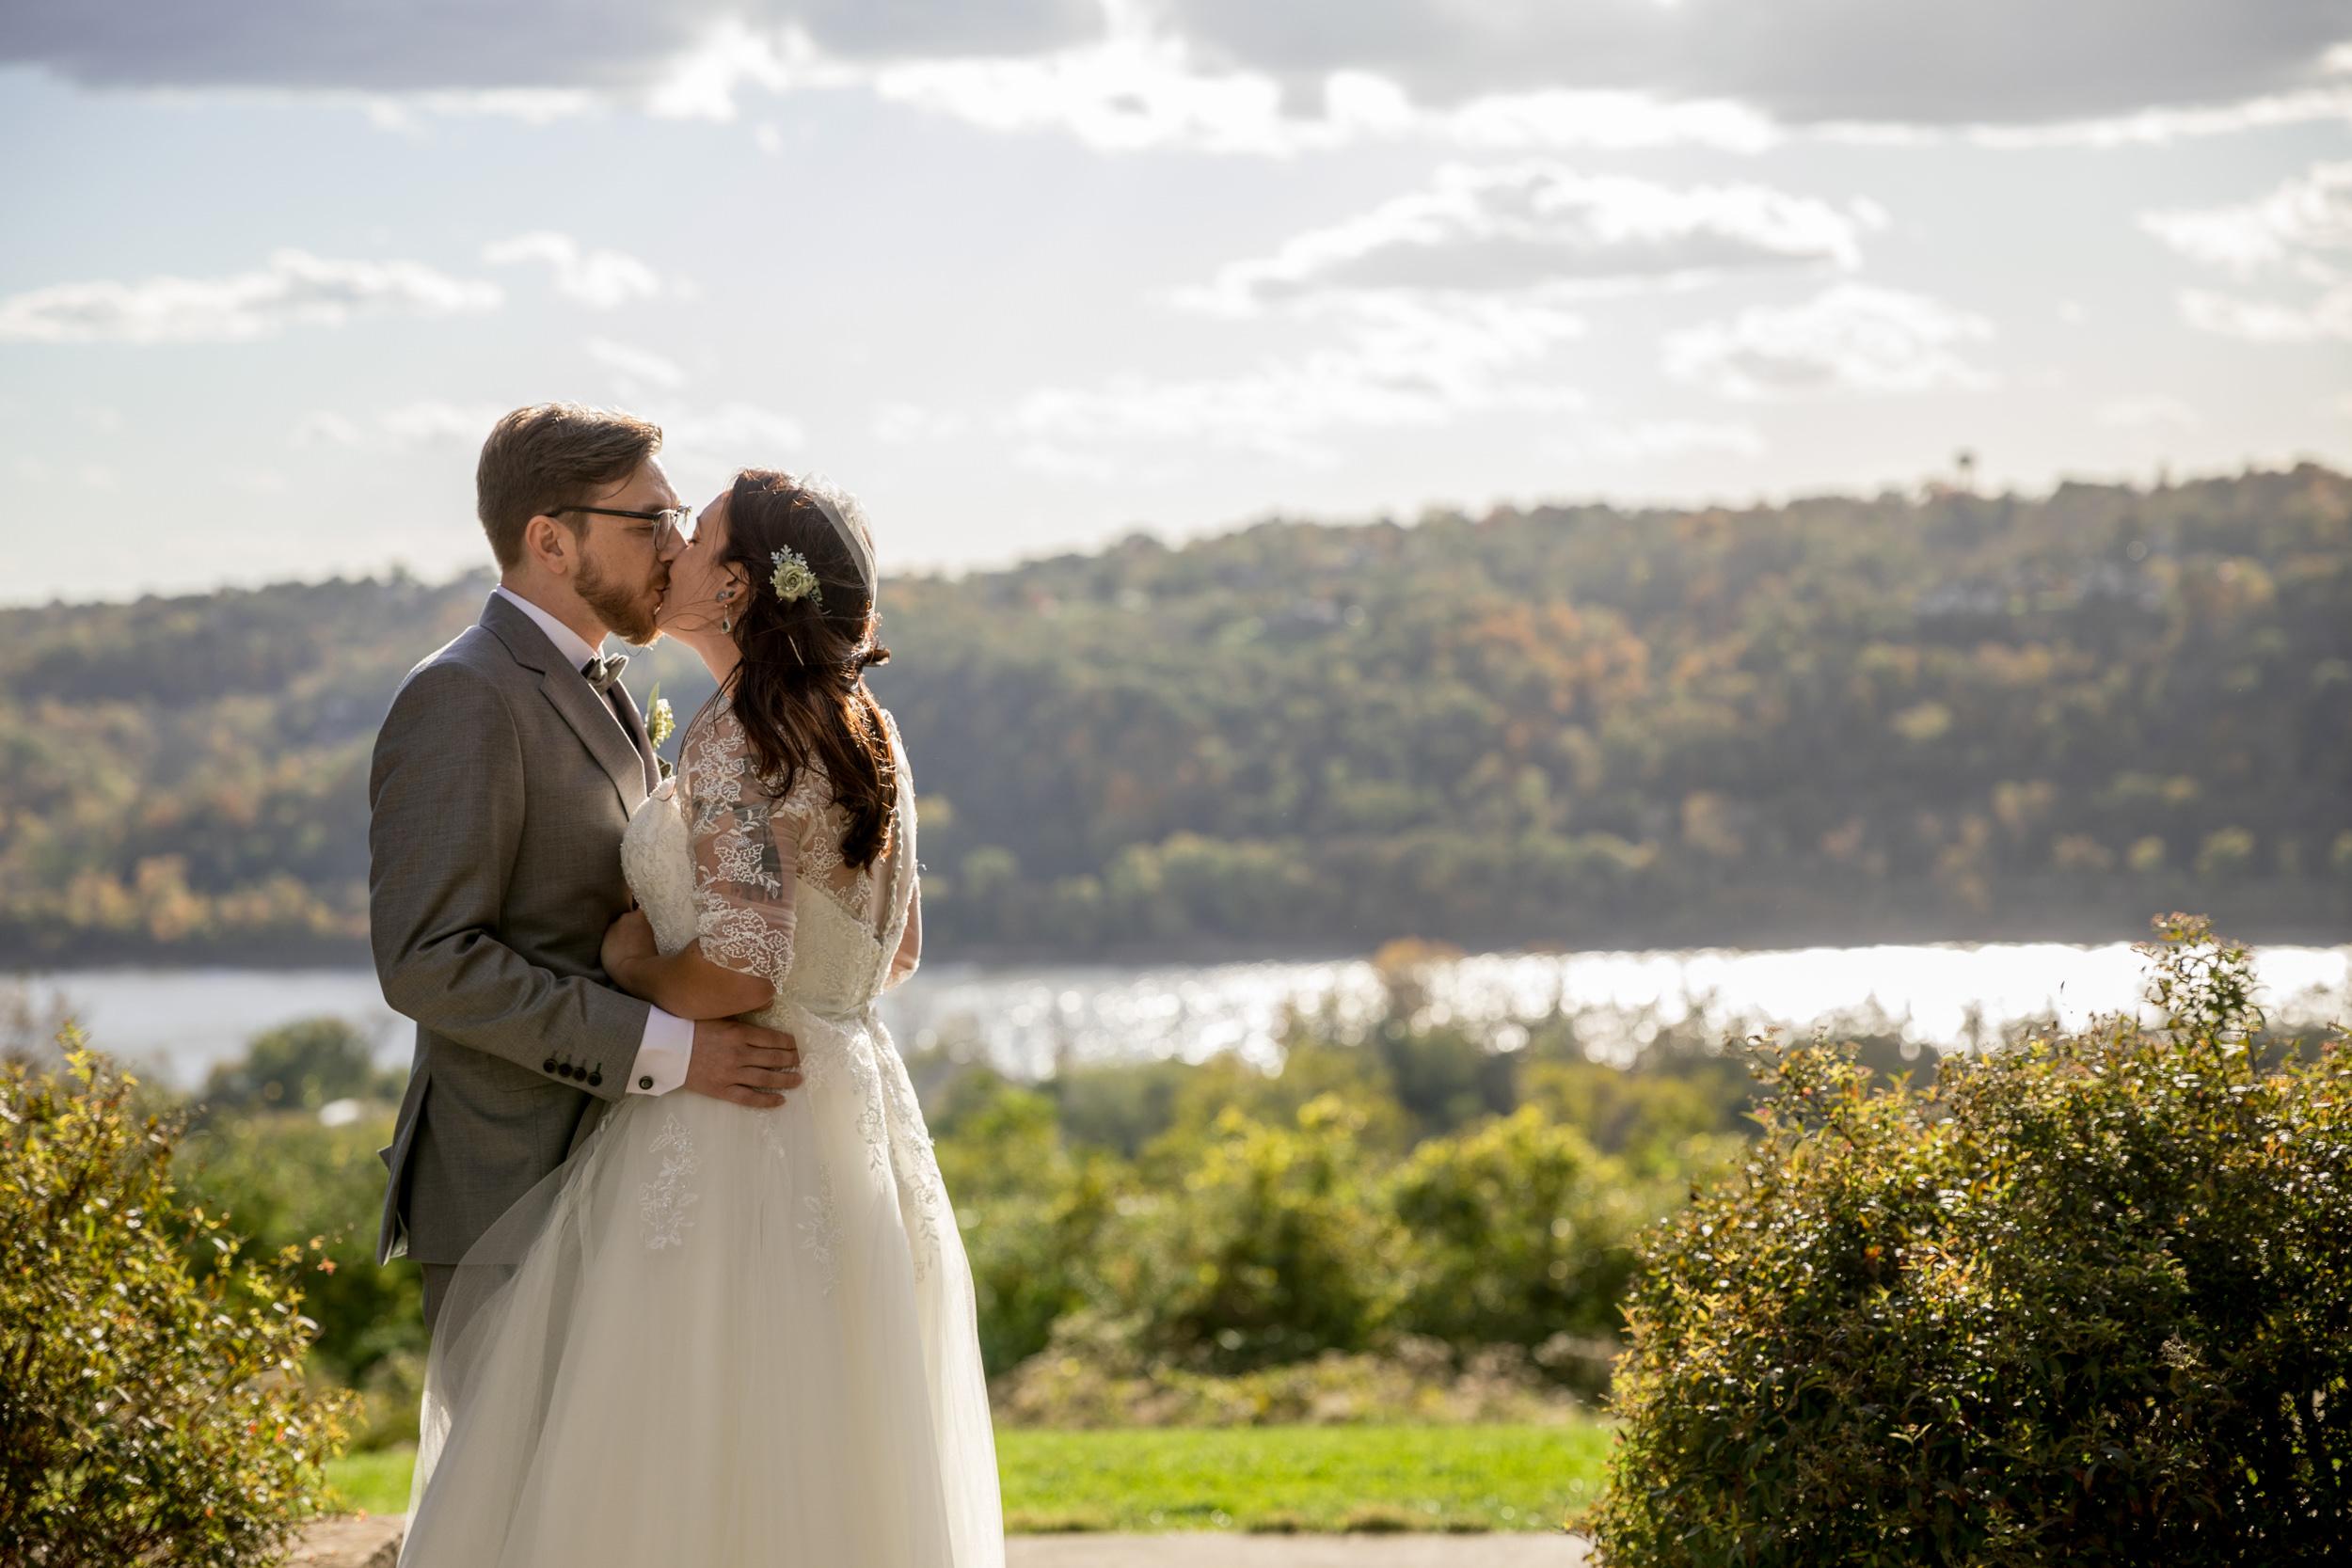 TheSmythCollective-Best-Cincinnati-Wedding-Photographer-017.jpg